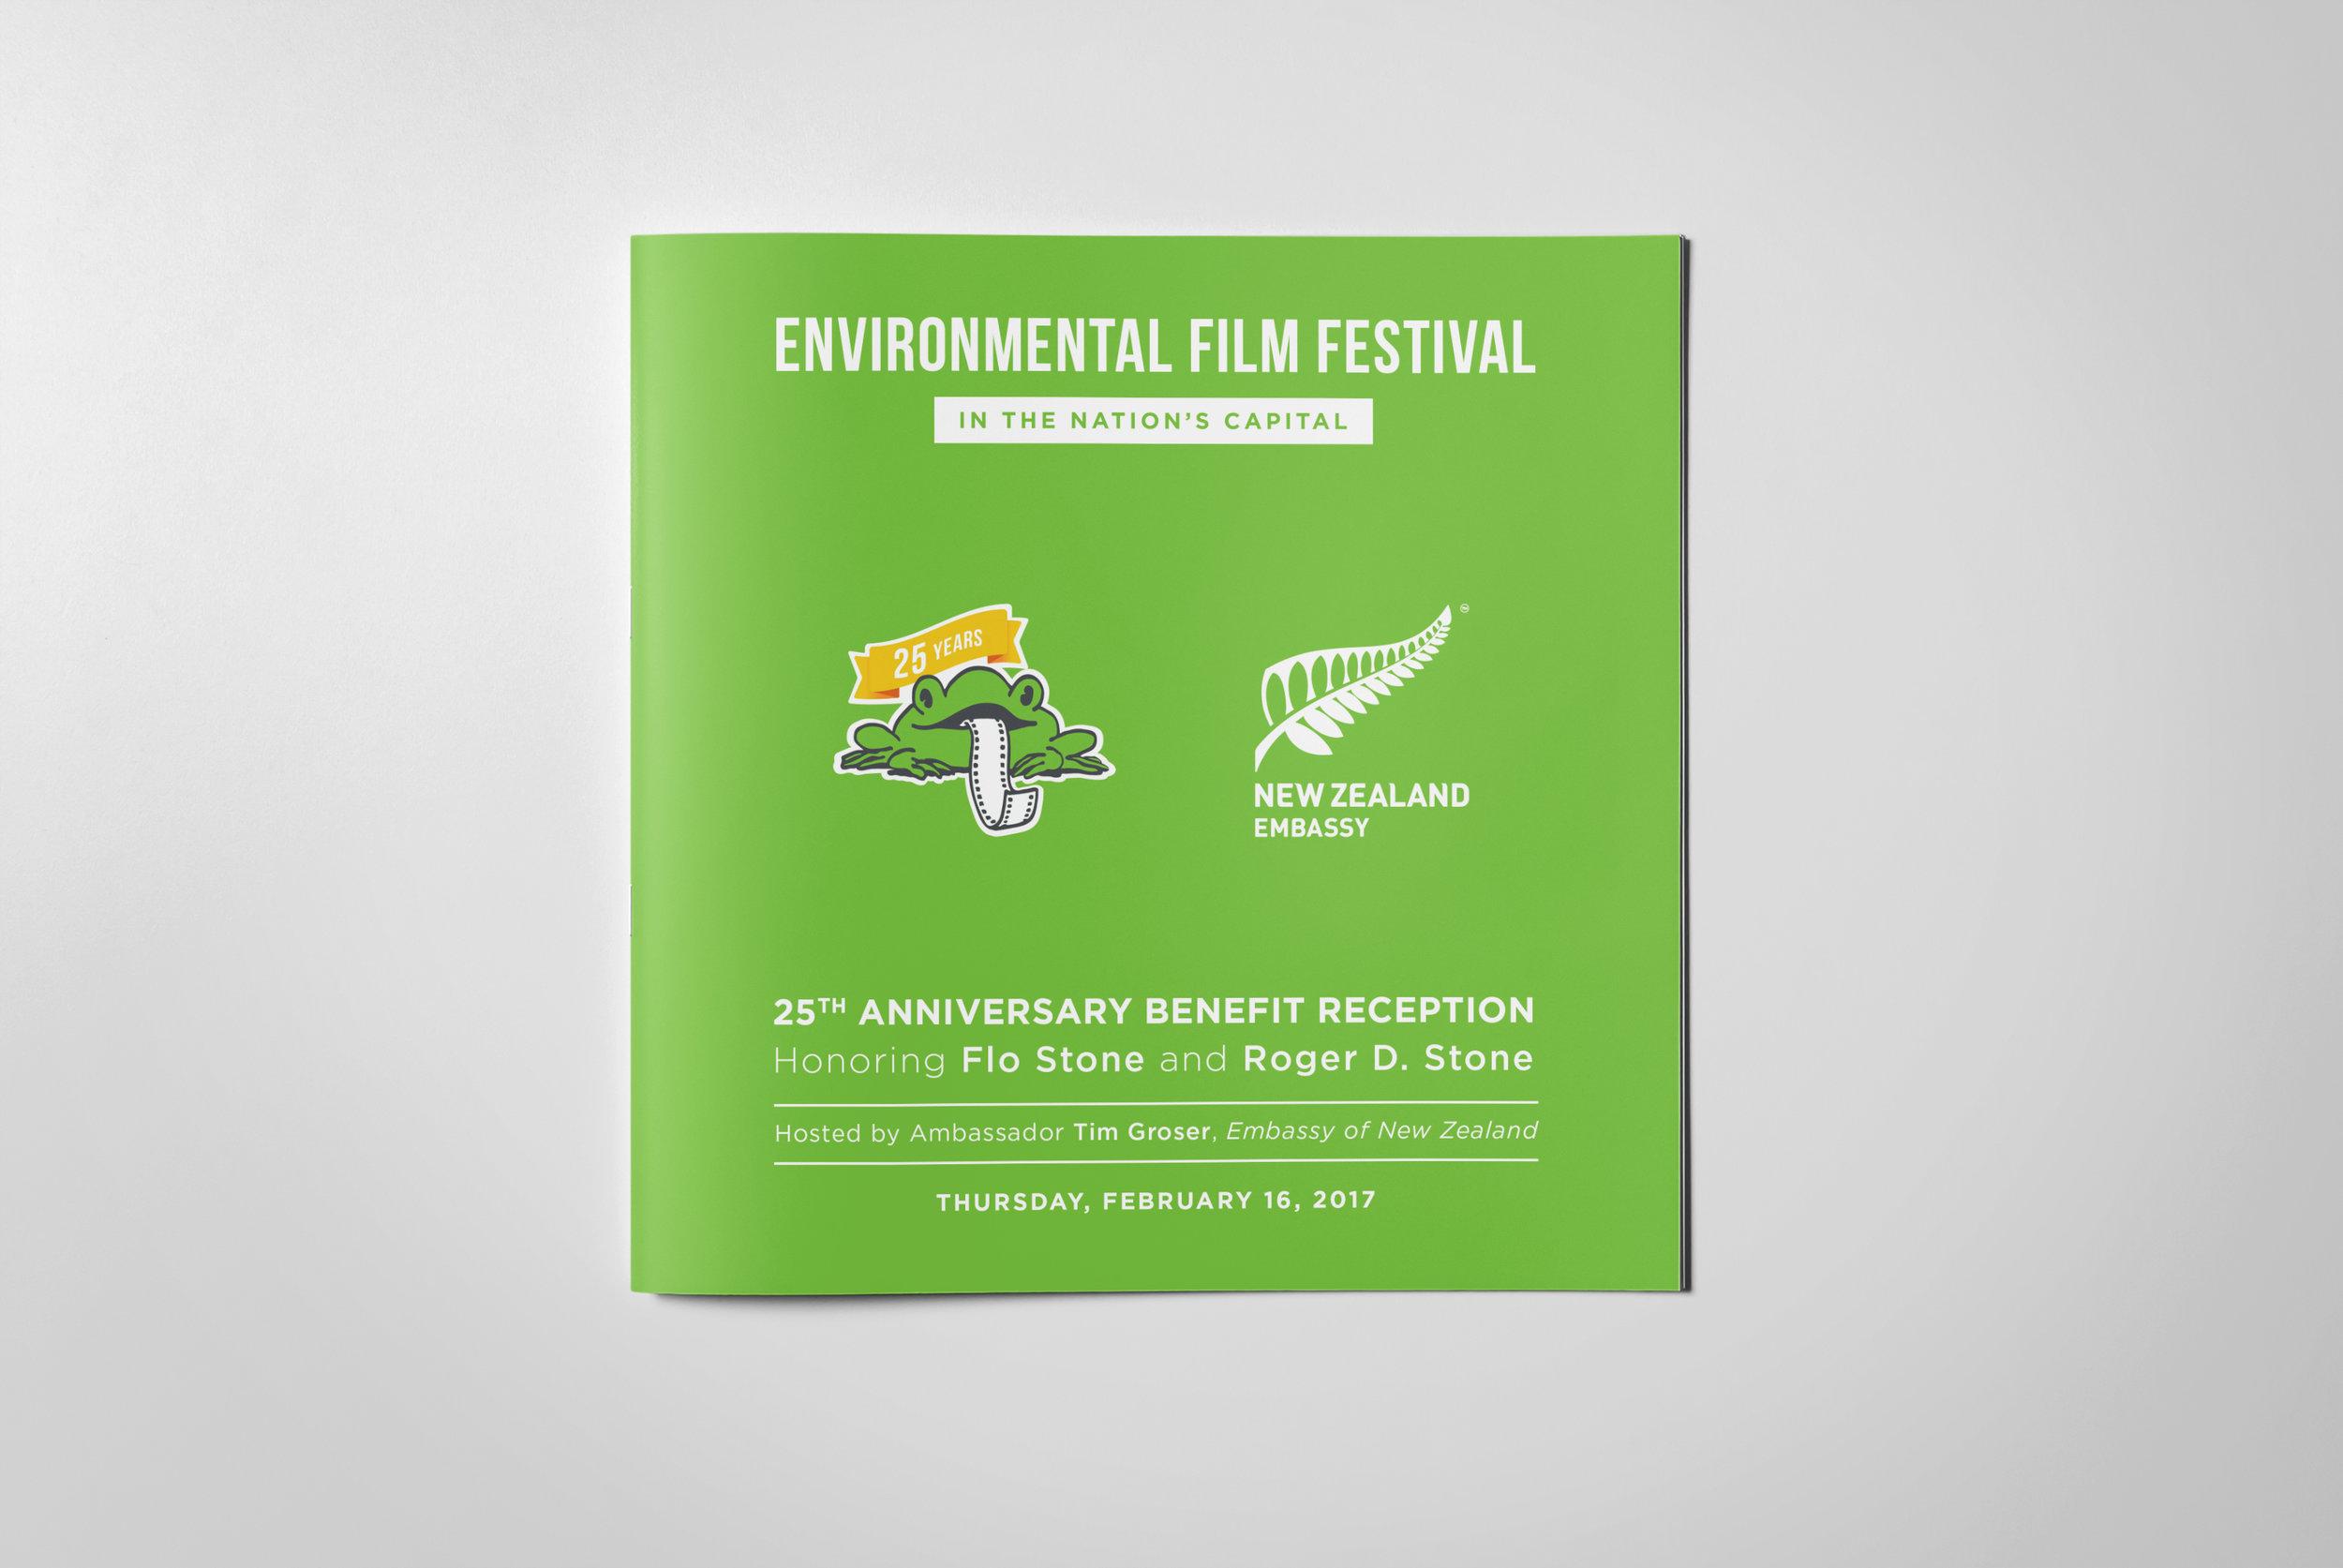 2017-08-19_EFF Program 3_FINAL.jpg